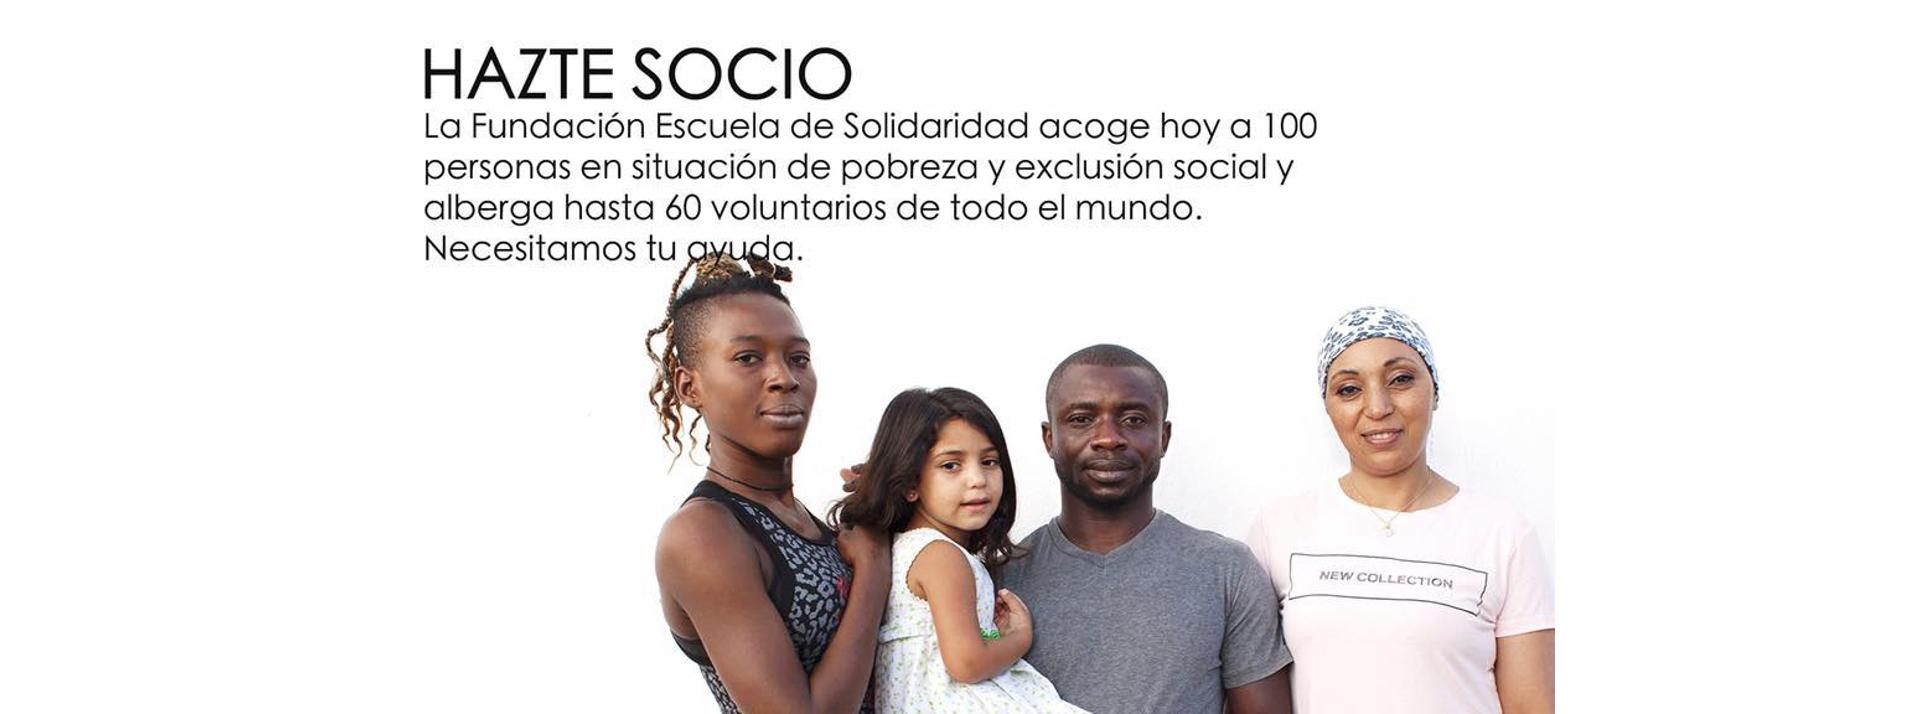 HAZTE SOCIO